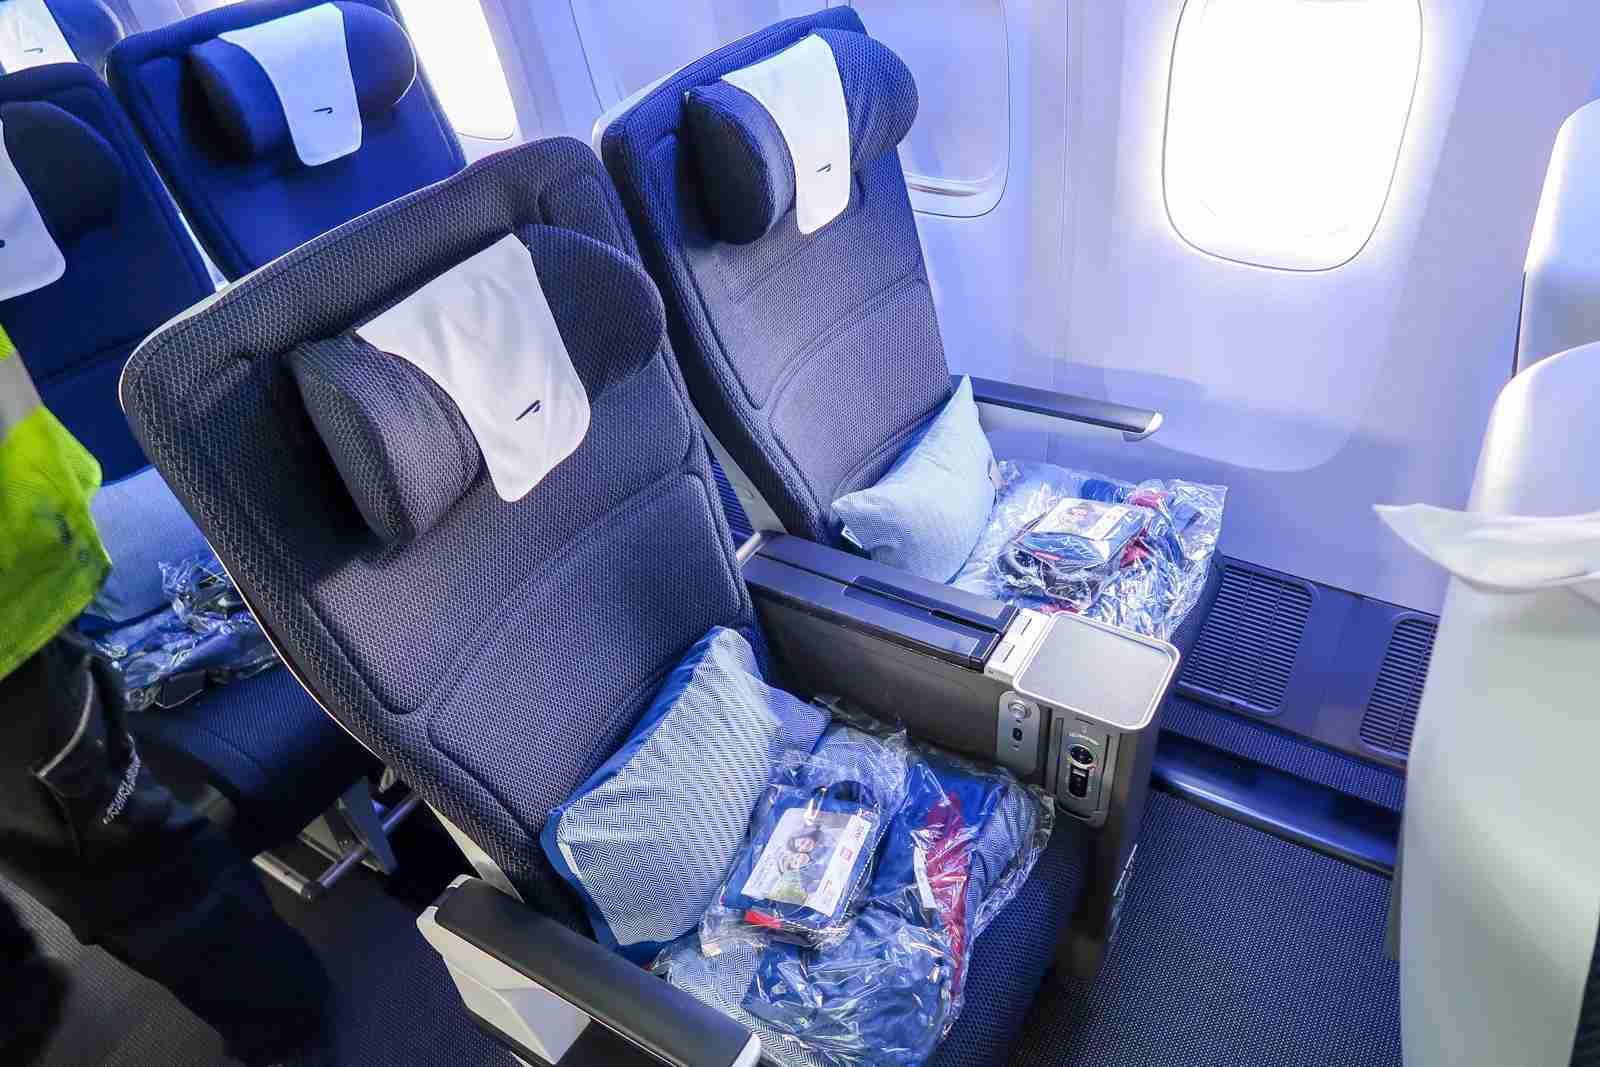 British Airways Premium Economy on the Boeing 777-200. (Photo by Ben Smithson/The Points Guy)